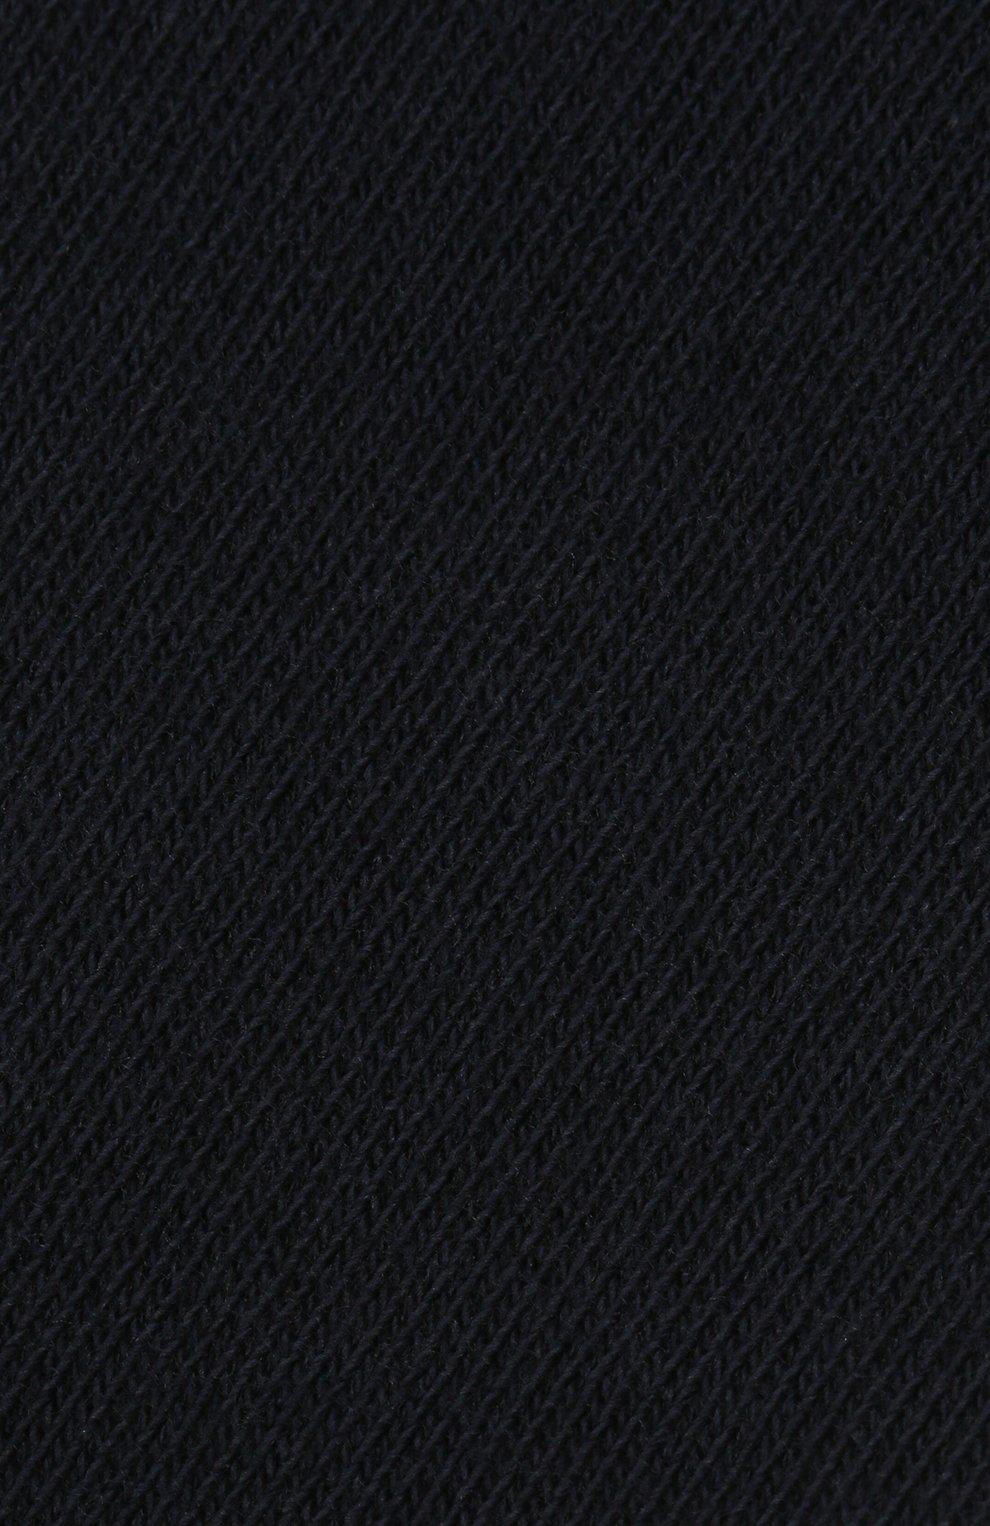 Детские колготки FALKE темно-синего цвета, арт. 13645. | Фото 2 (Материал: Текстиль, Хлопок)